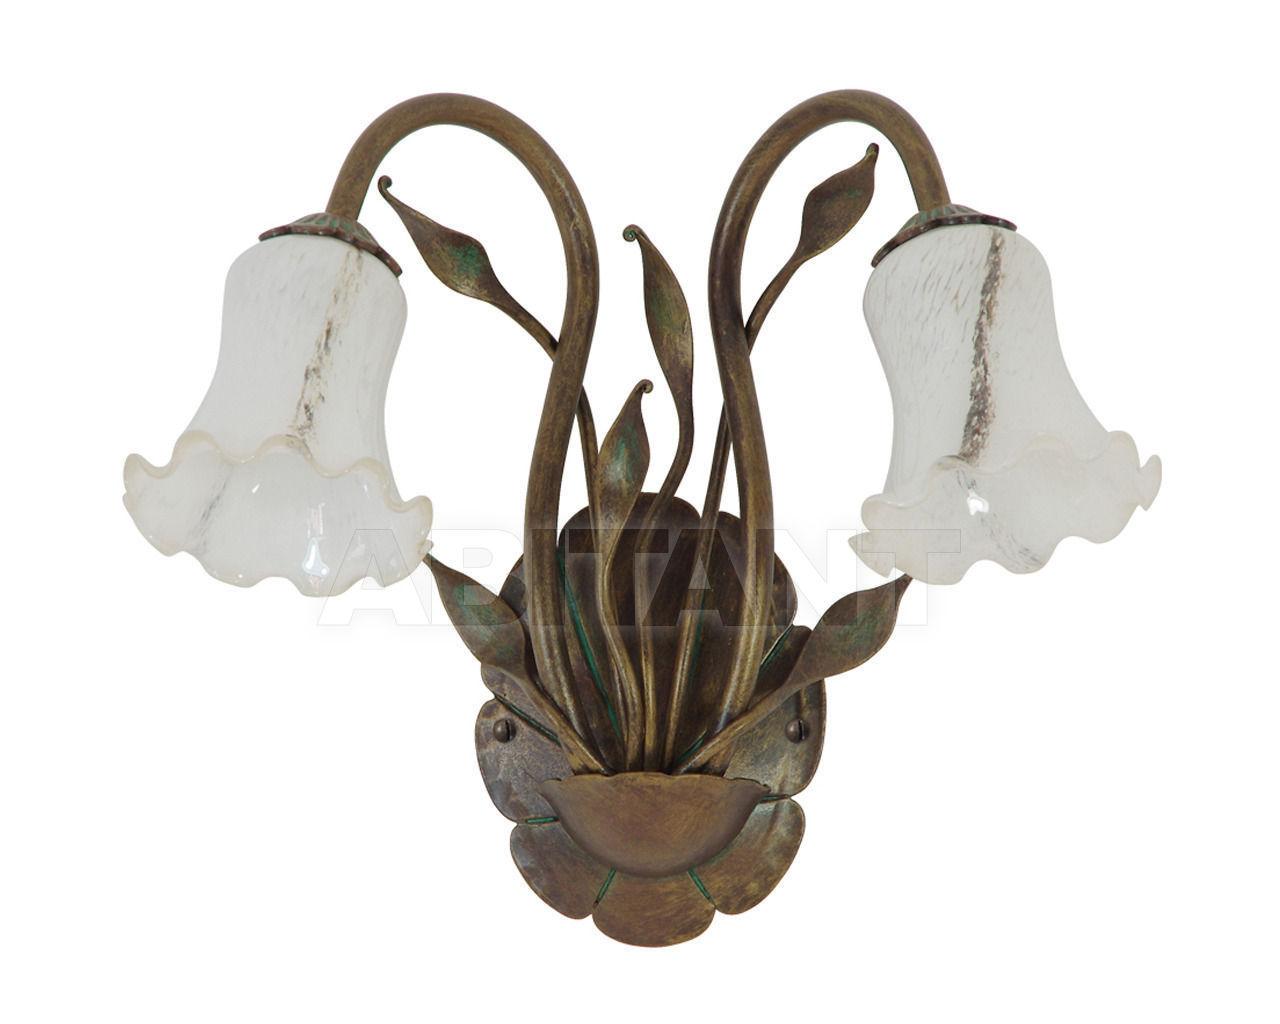 Купить Светильник настенный FMB Leuchten Schmiedeeisen Lampen Und Leuchten 94150